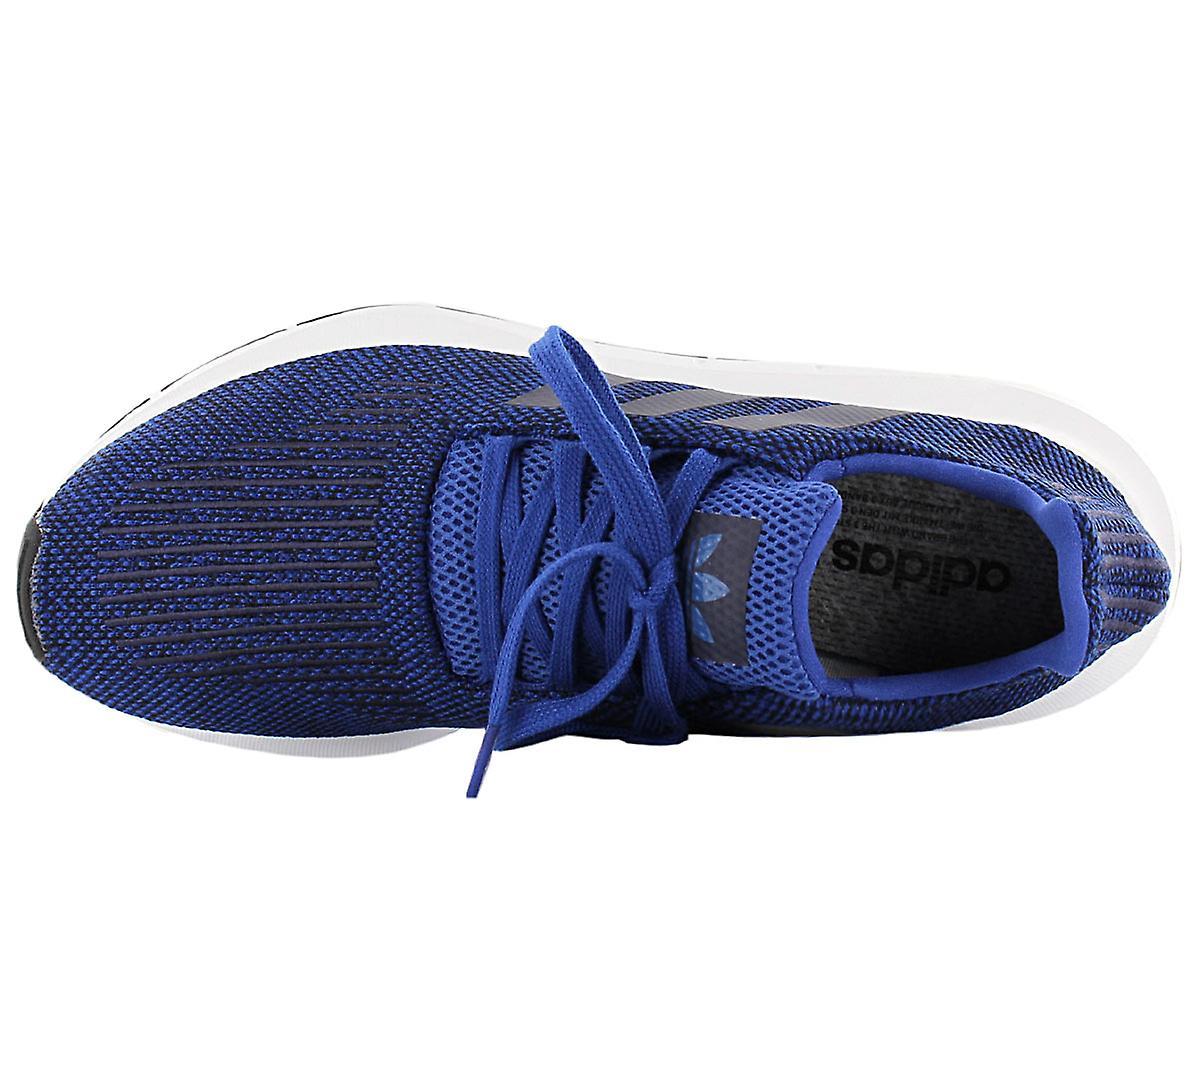 adidas Originals Swift Run CG4118 - Chaussures Chaussures Pour hommes Blue Sneakers Chaussures de sport